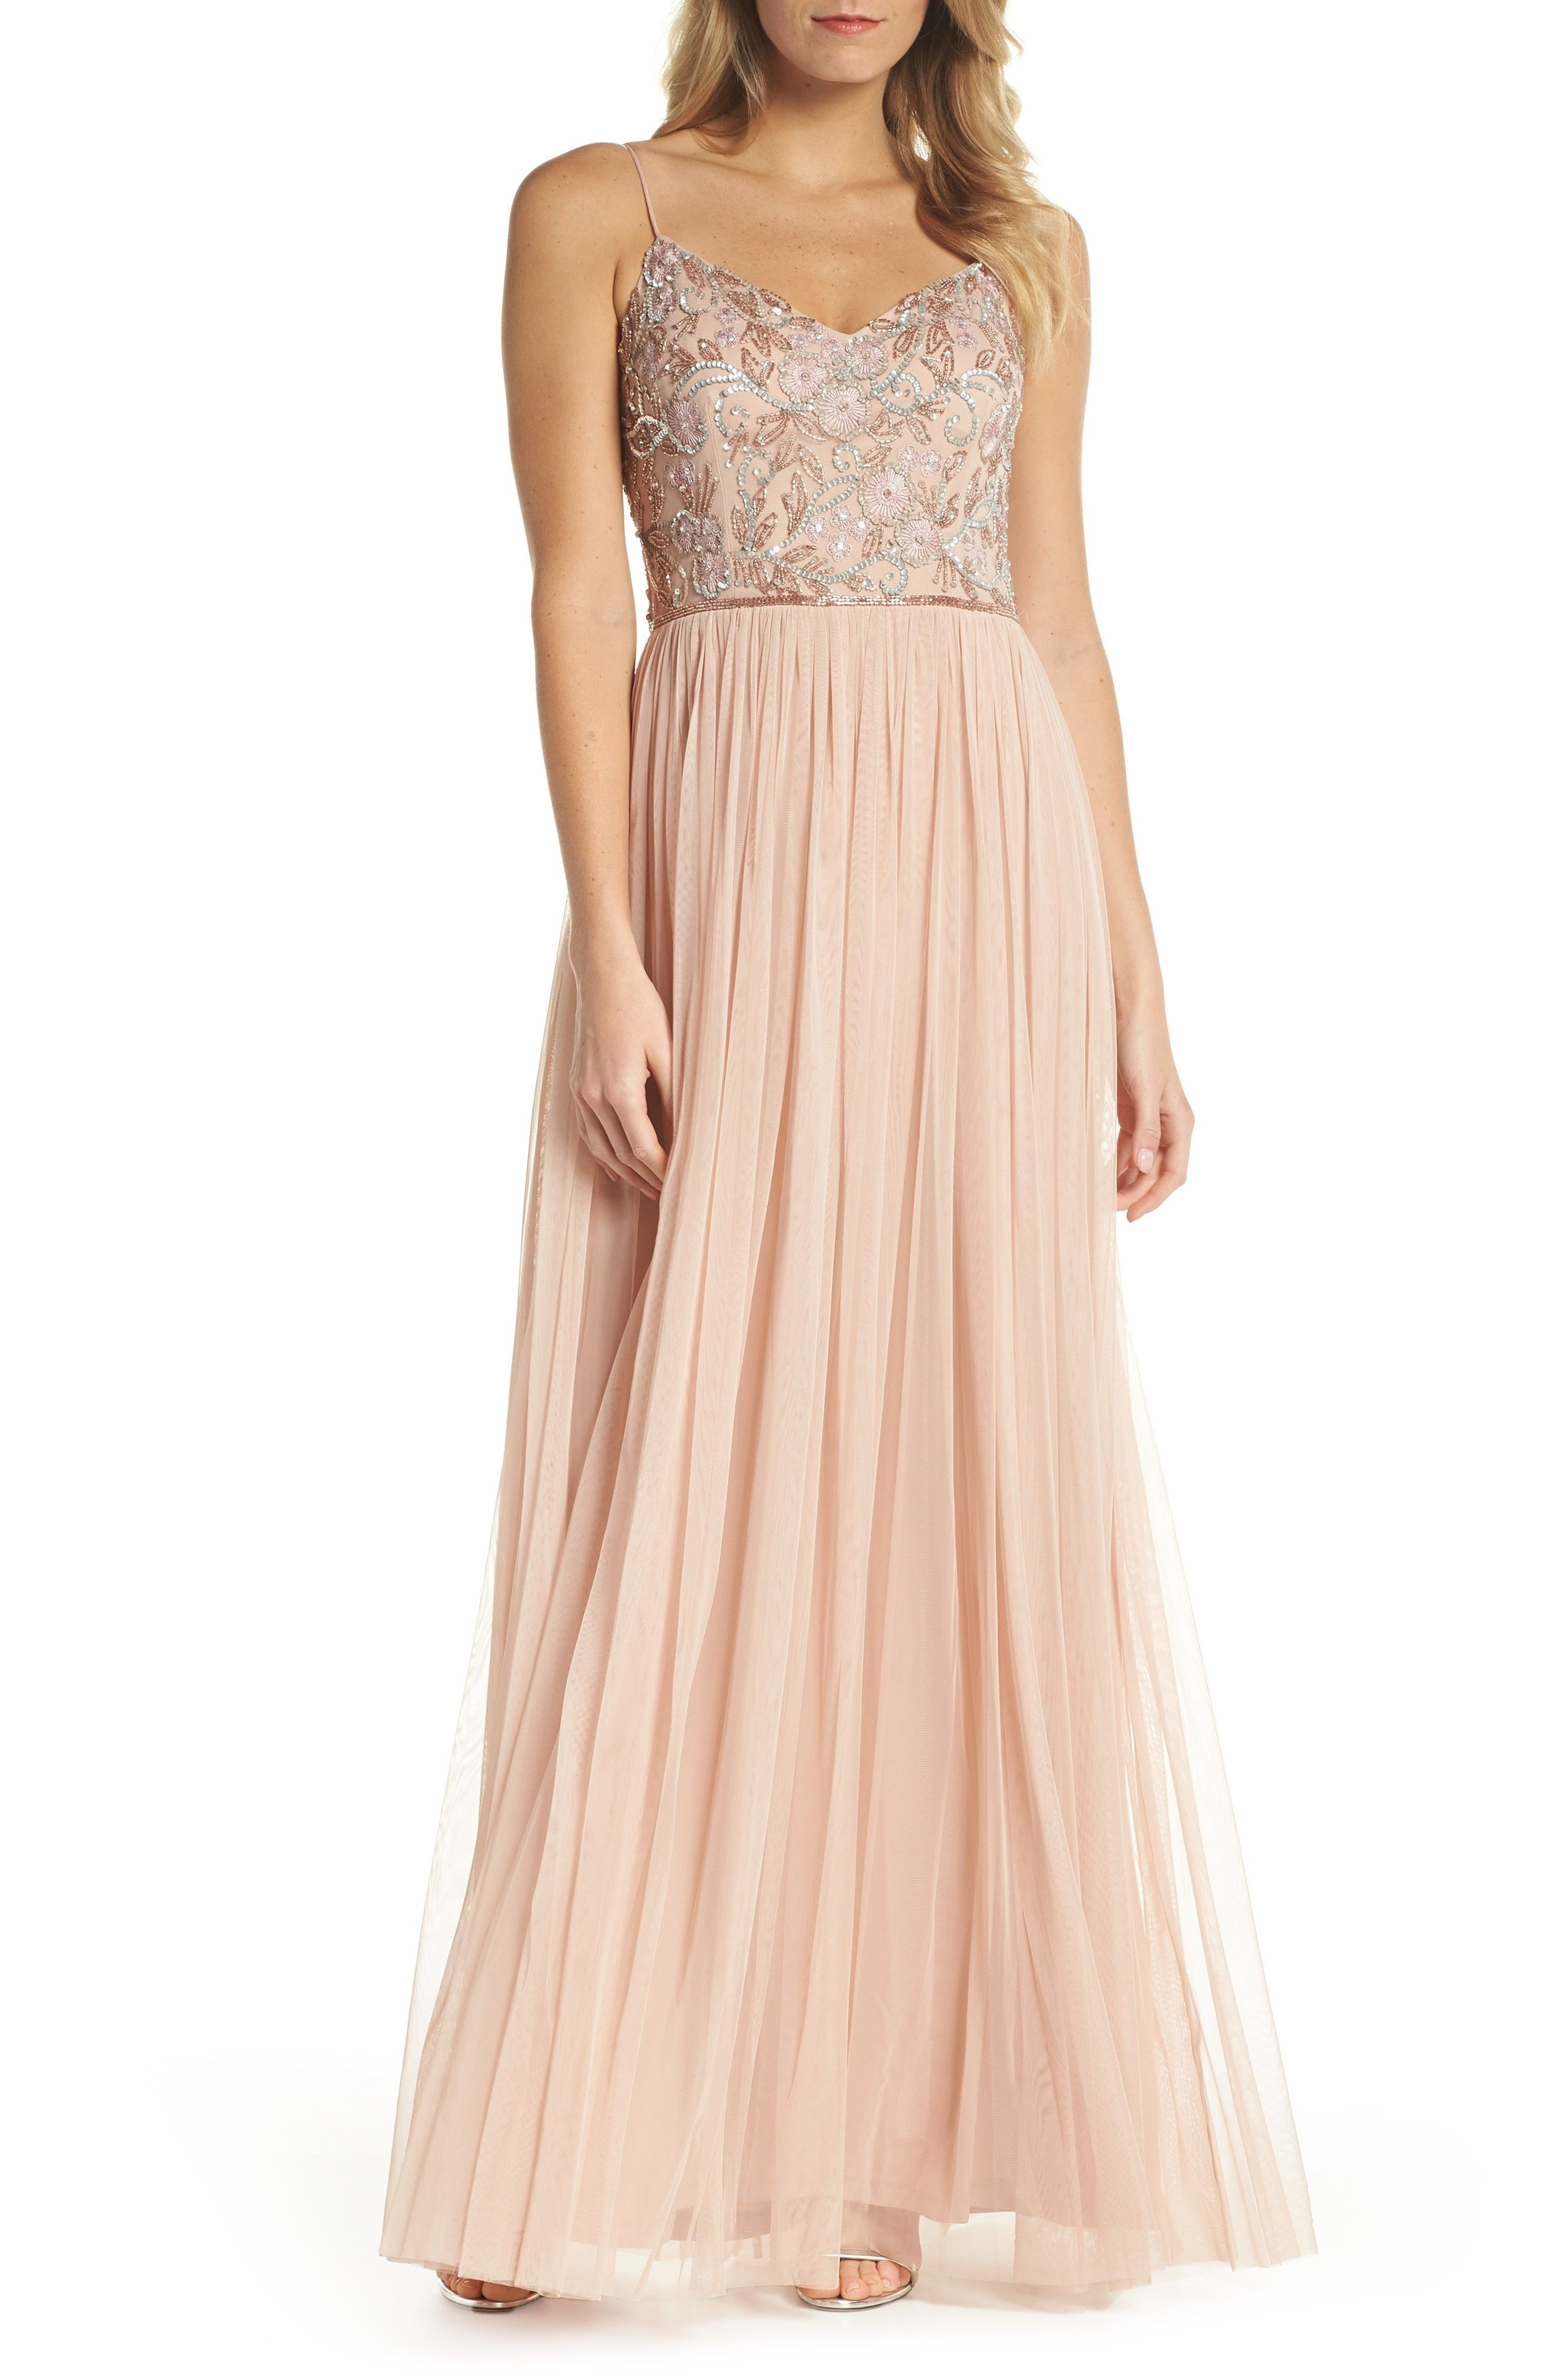 Adrianna Papell Beaded Mesh Gown Affiliatelink Bridesmaiddress